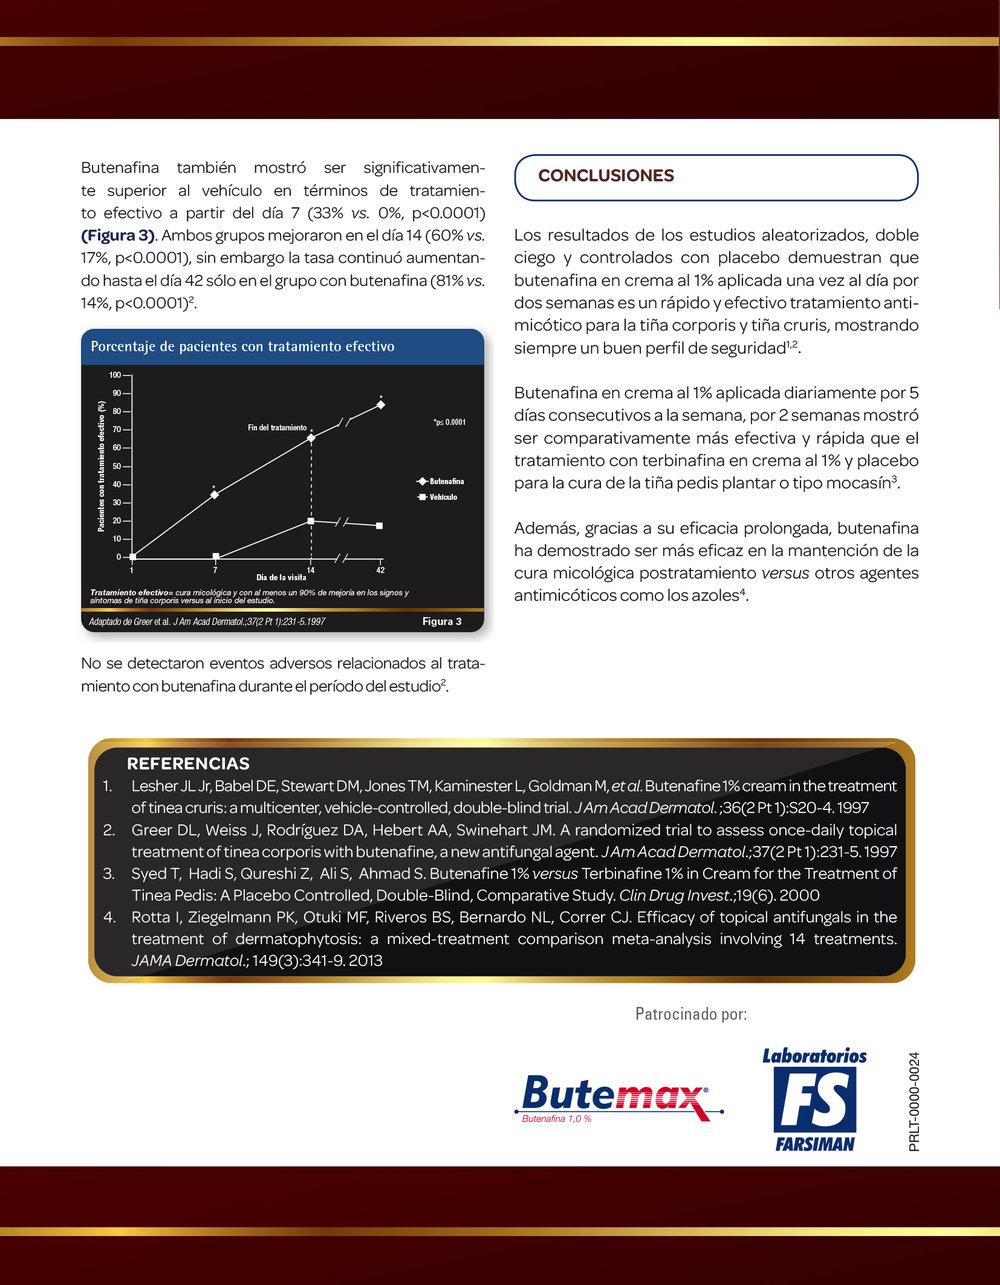 Butemax_DIPTICO FINAL V 15-4.jpg